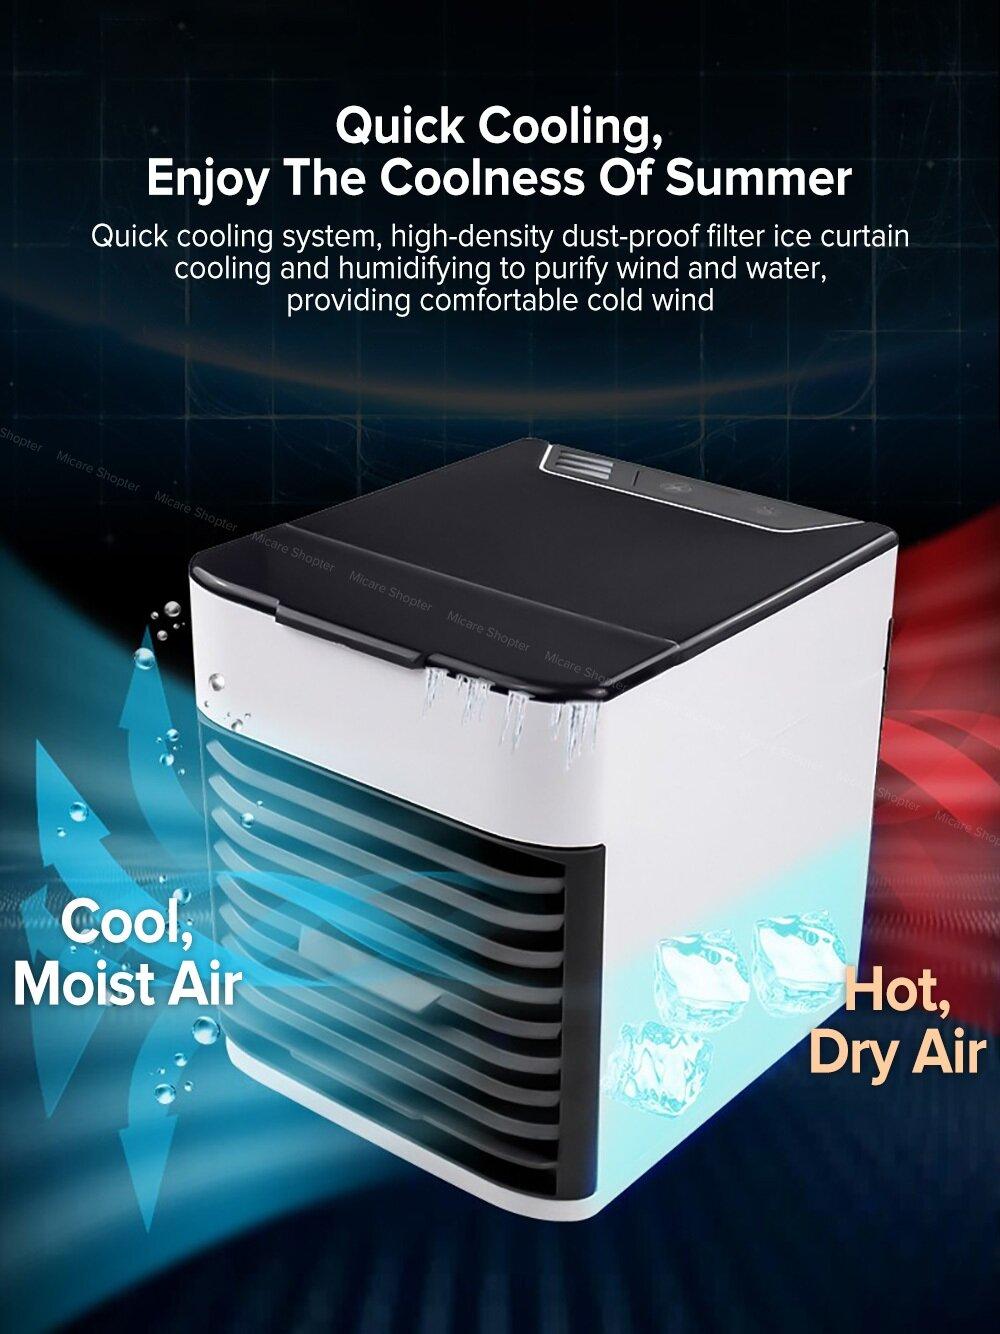 Охладитель воздуха кондиционер USB Arctic Air Ultra 2X - фото pic_aab6f942ede8ad96f2a271ef007e65dd_1920x9000_1.jpg